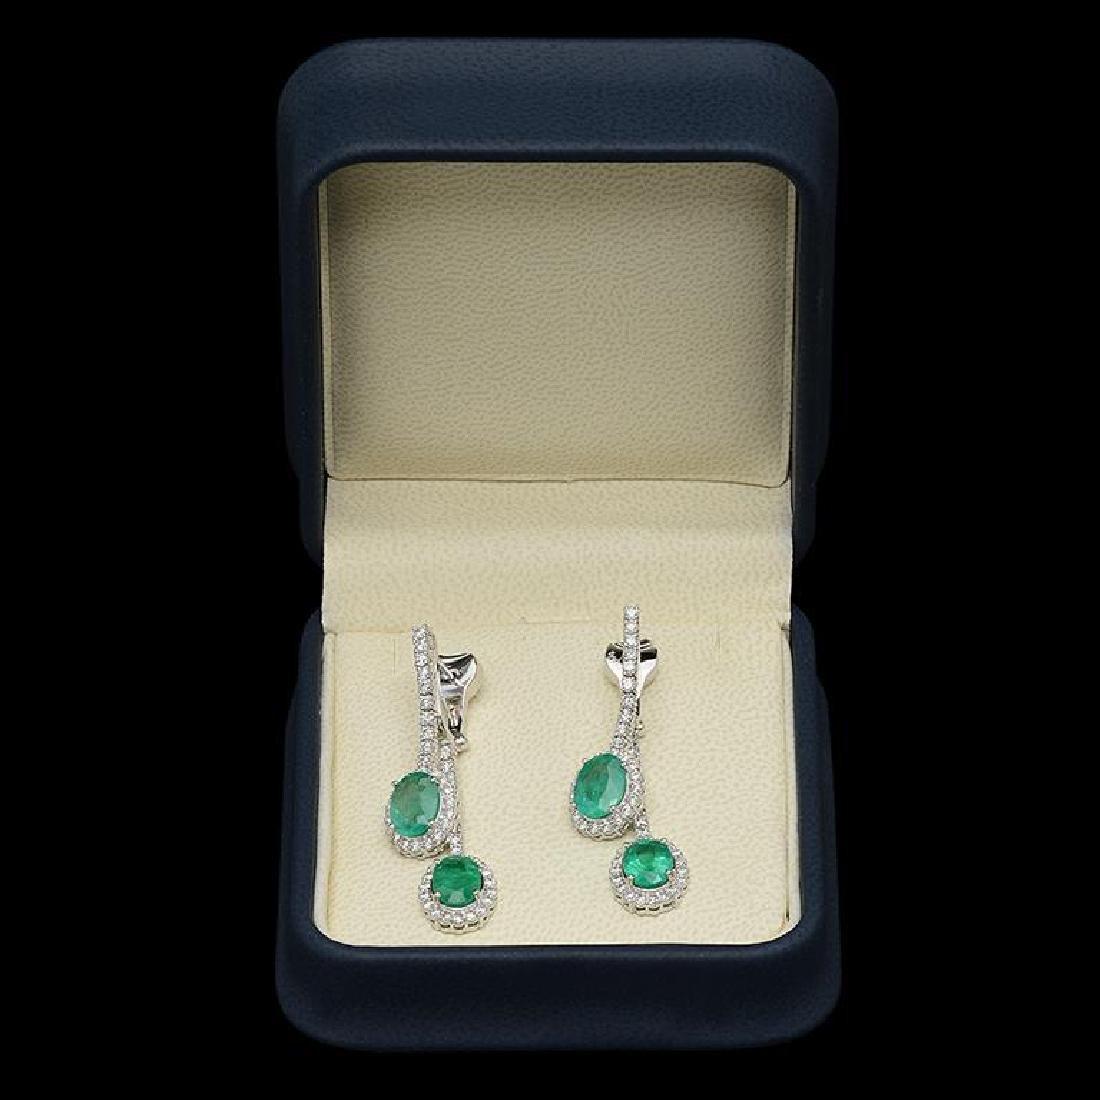 14K Gold 5.08ct Emerald & 1.97ct Diamond Earrings - 2